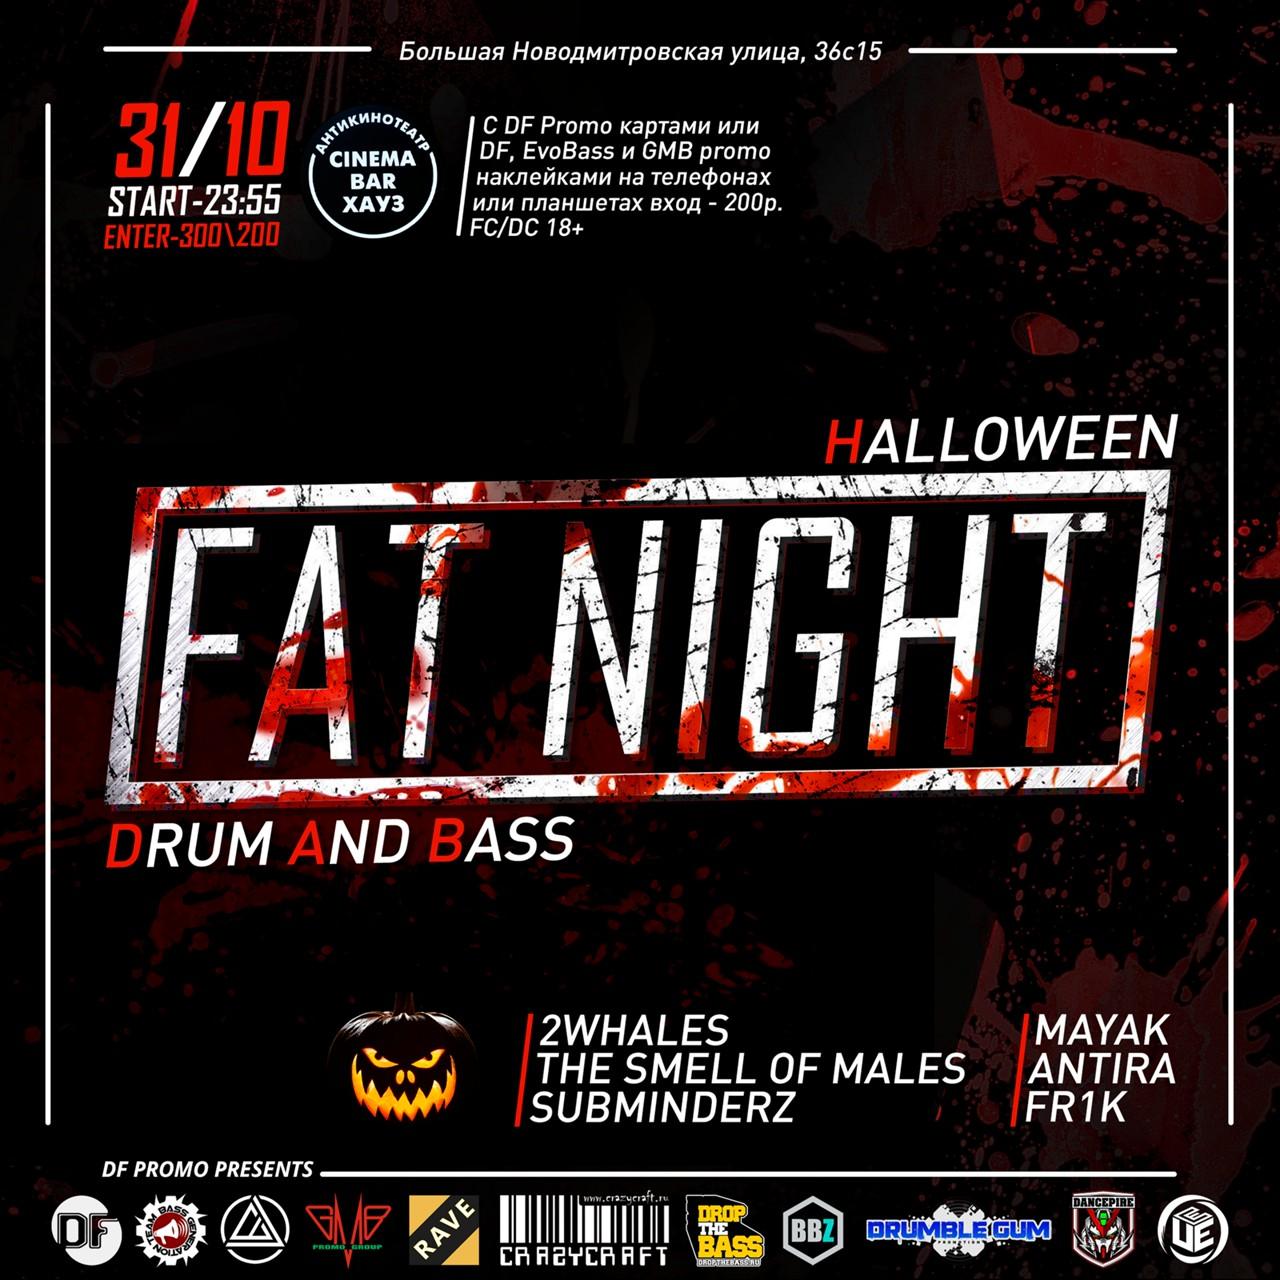 Афиша 31.10 > FAT NIGHT: Halloween CINEMA BAR ХАУЗ